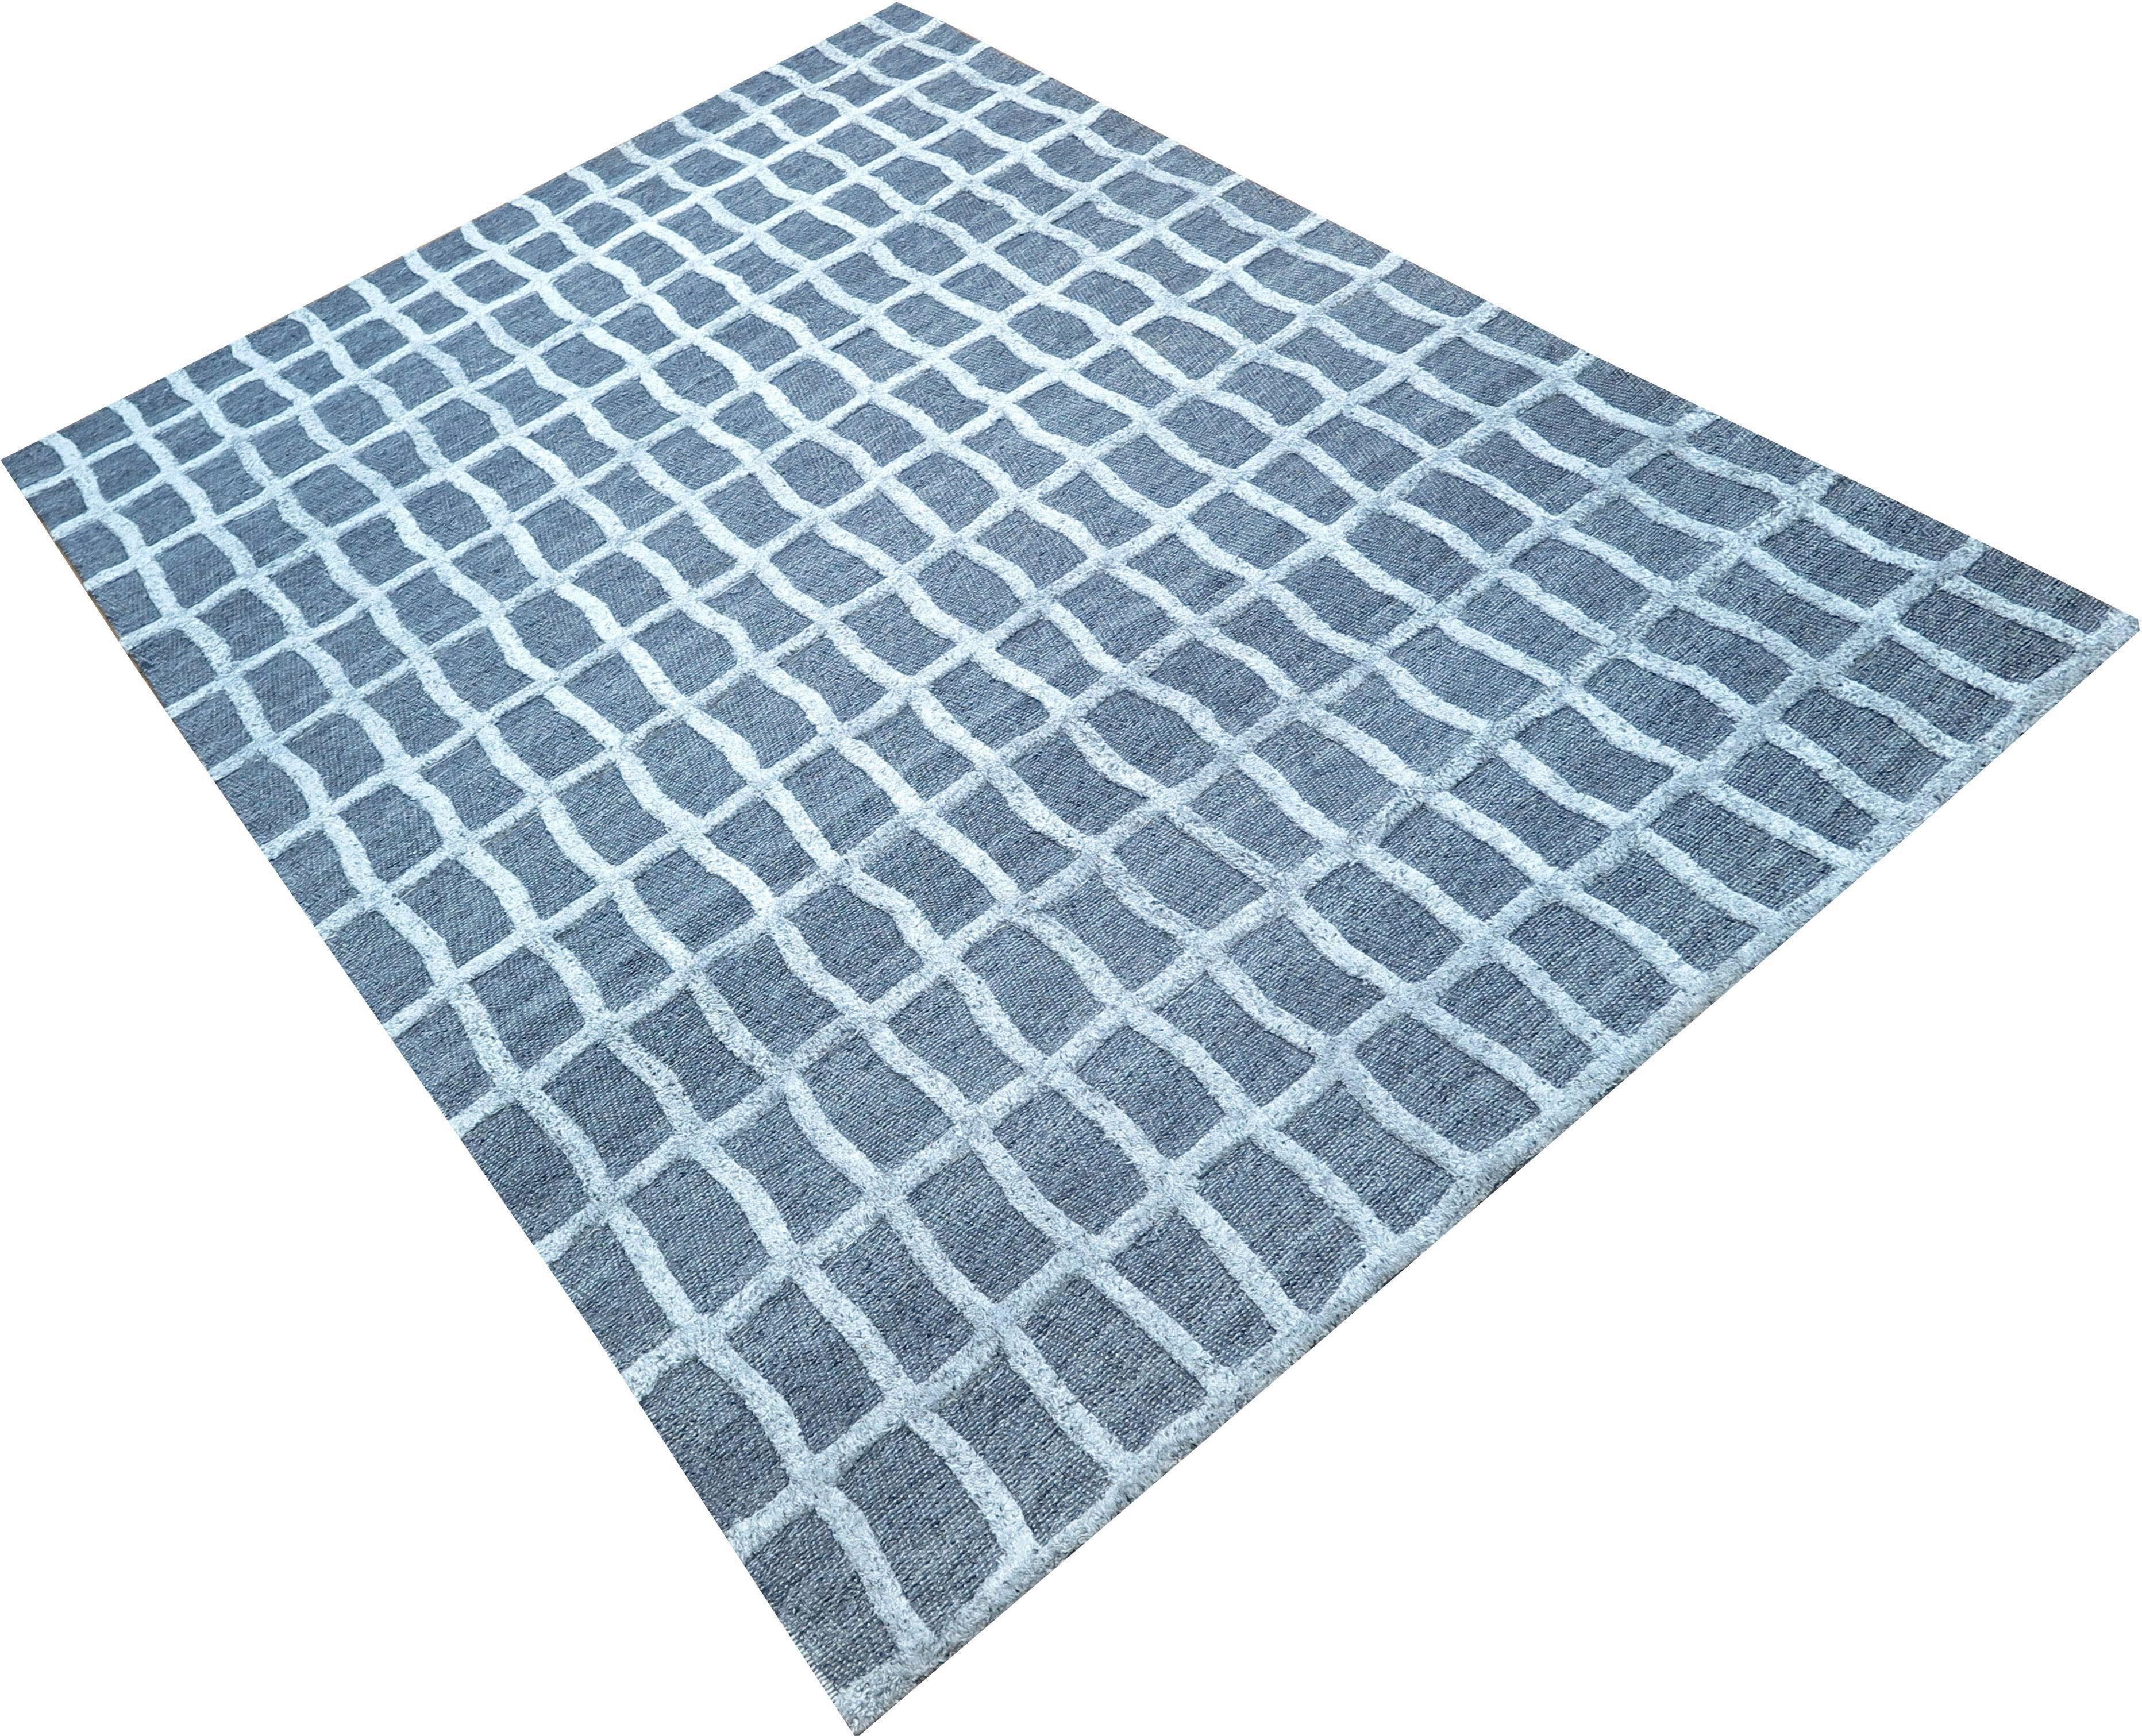 Teppich »Gisli«, SIT, rechteckig, Höhe 8 mm